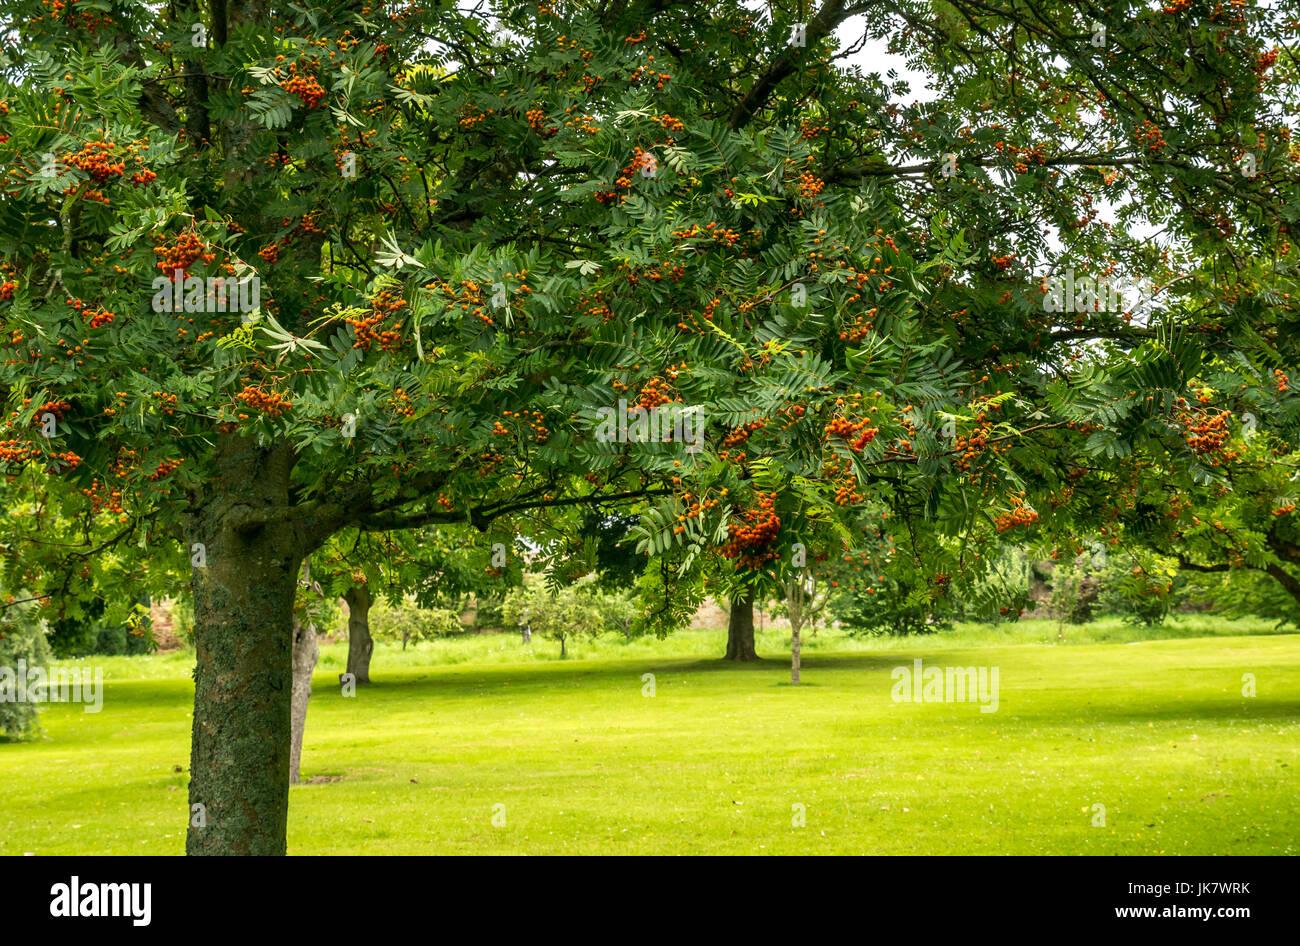 rowan-tree-and-lawn-in-st-marys-pleasanc